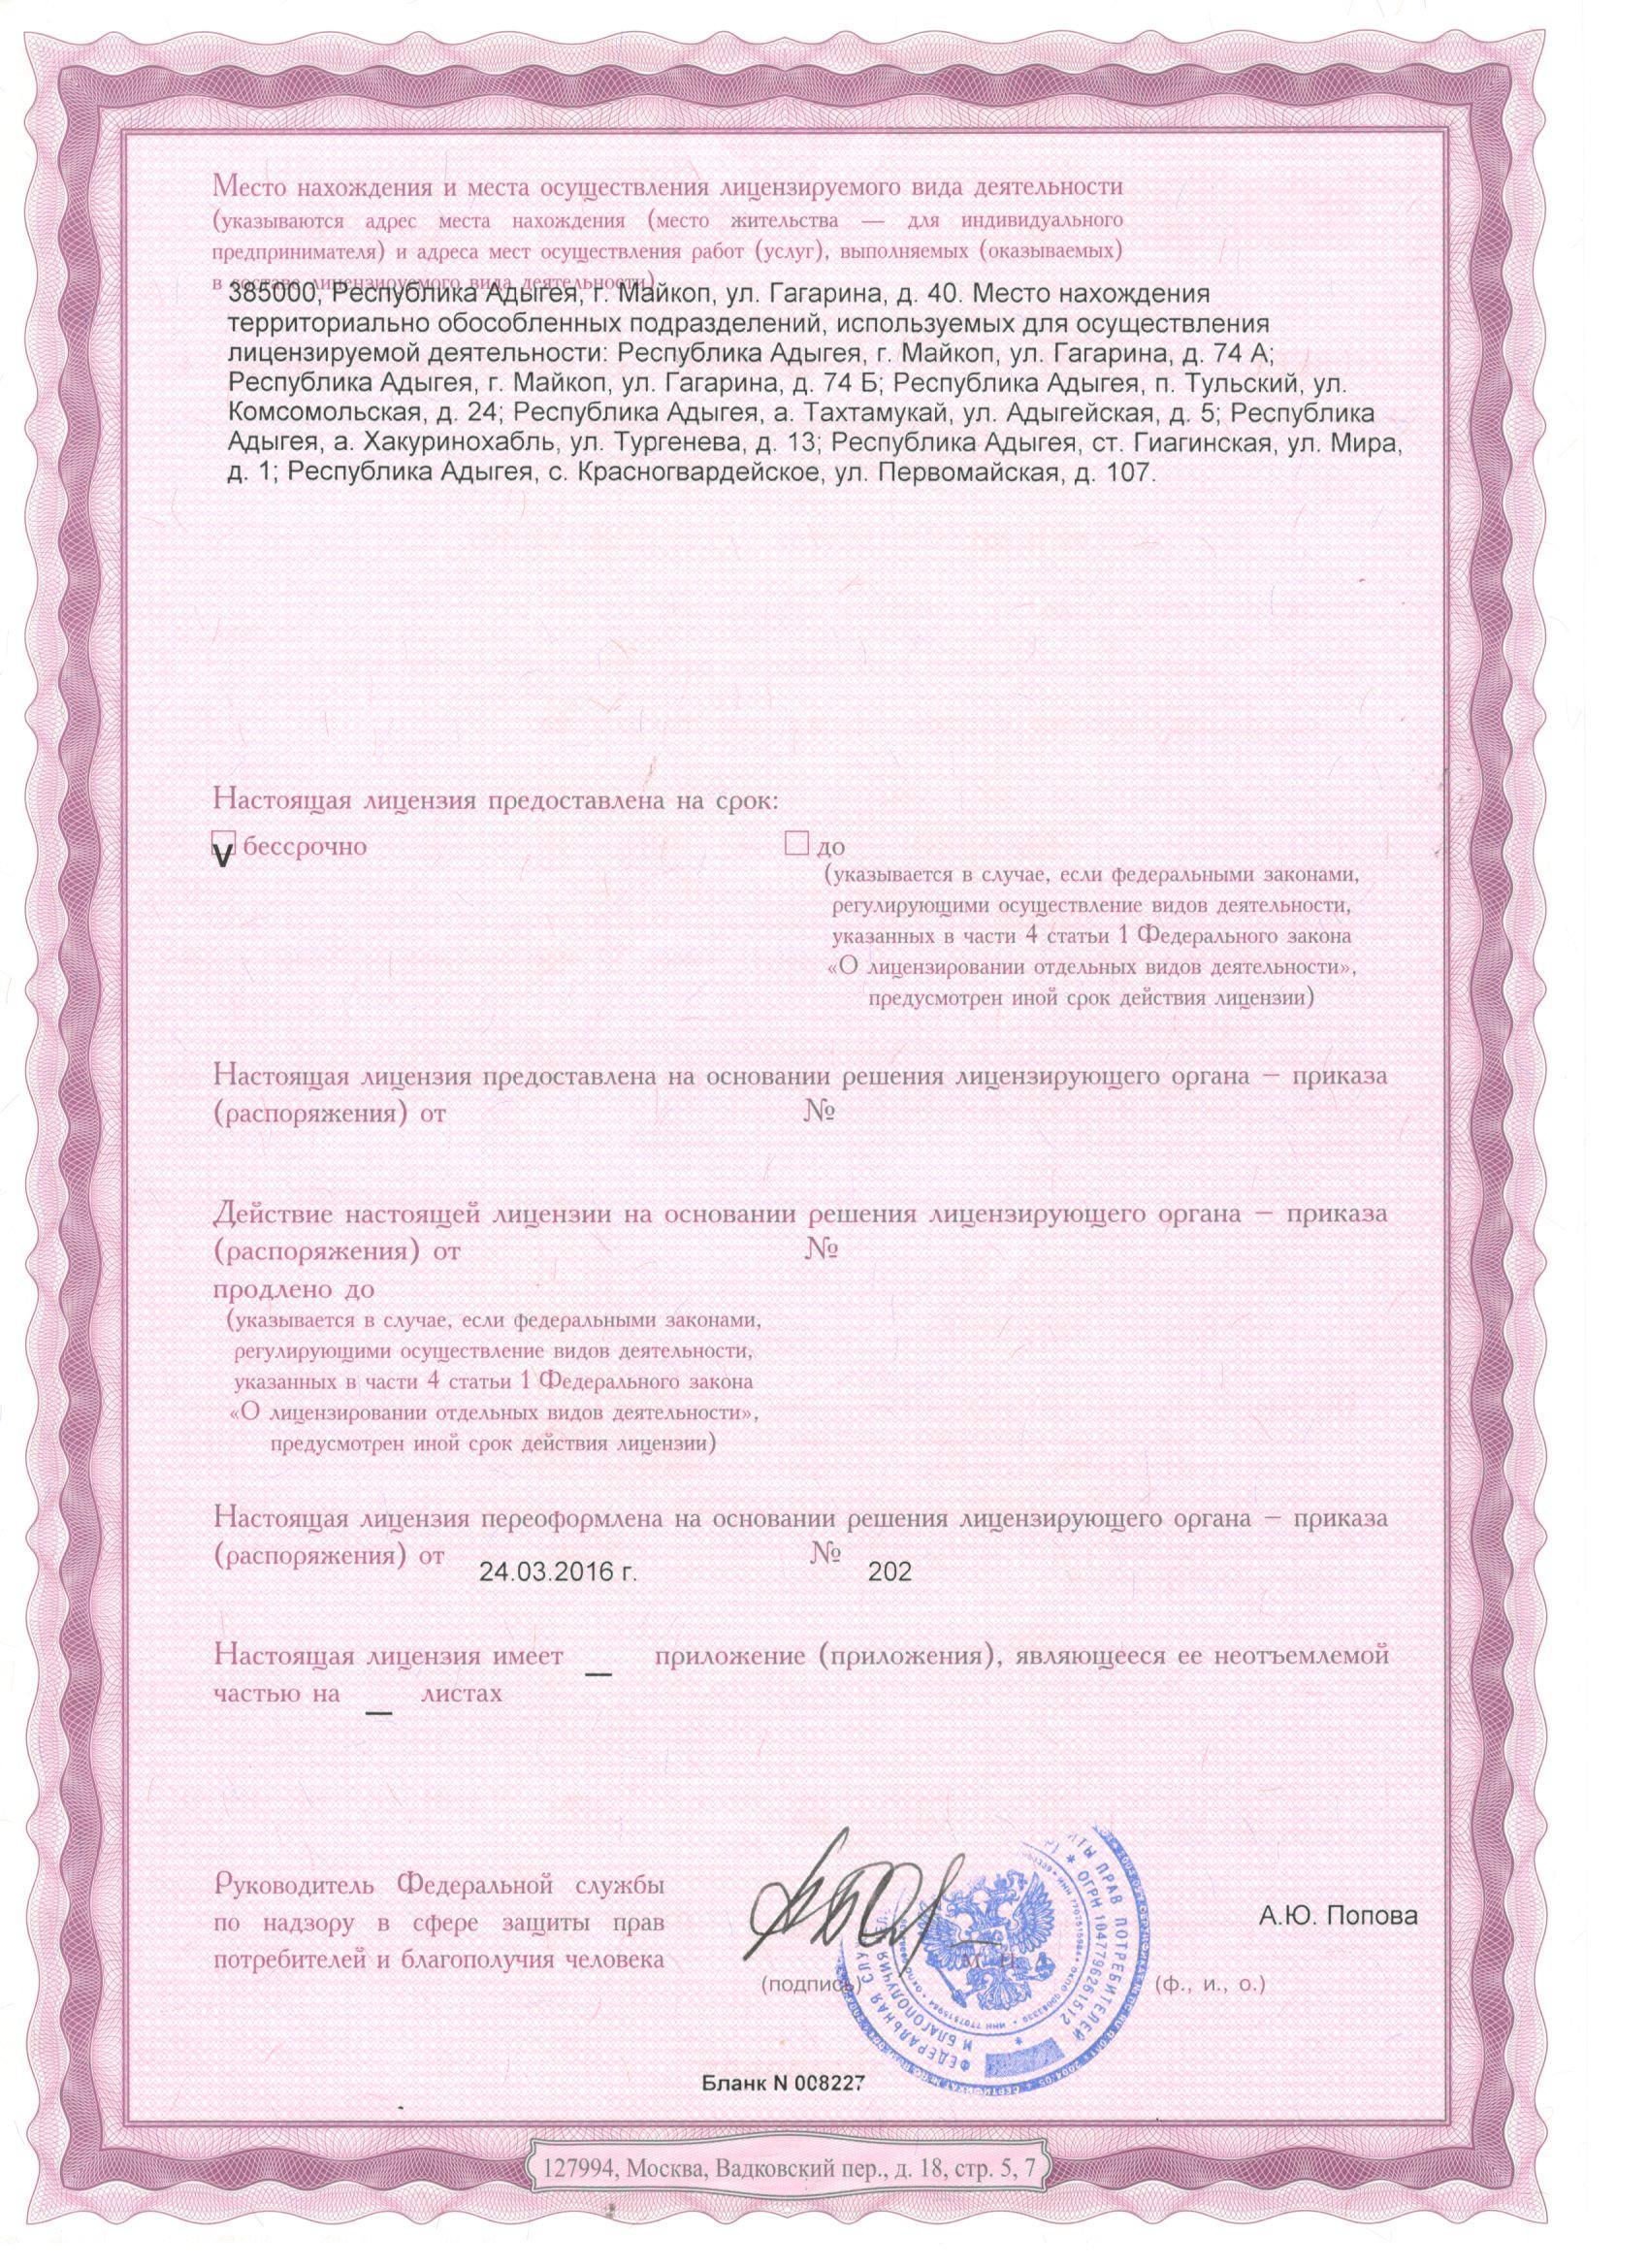 http://fbuz01.rospotrebnadzor.ru/s/218/storage/006_9779.jpg